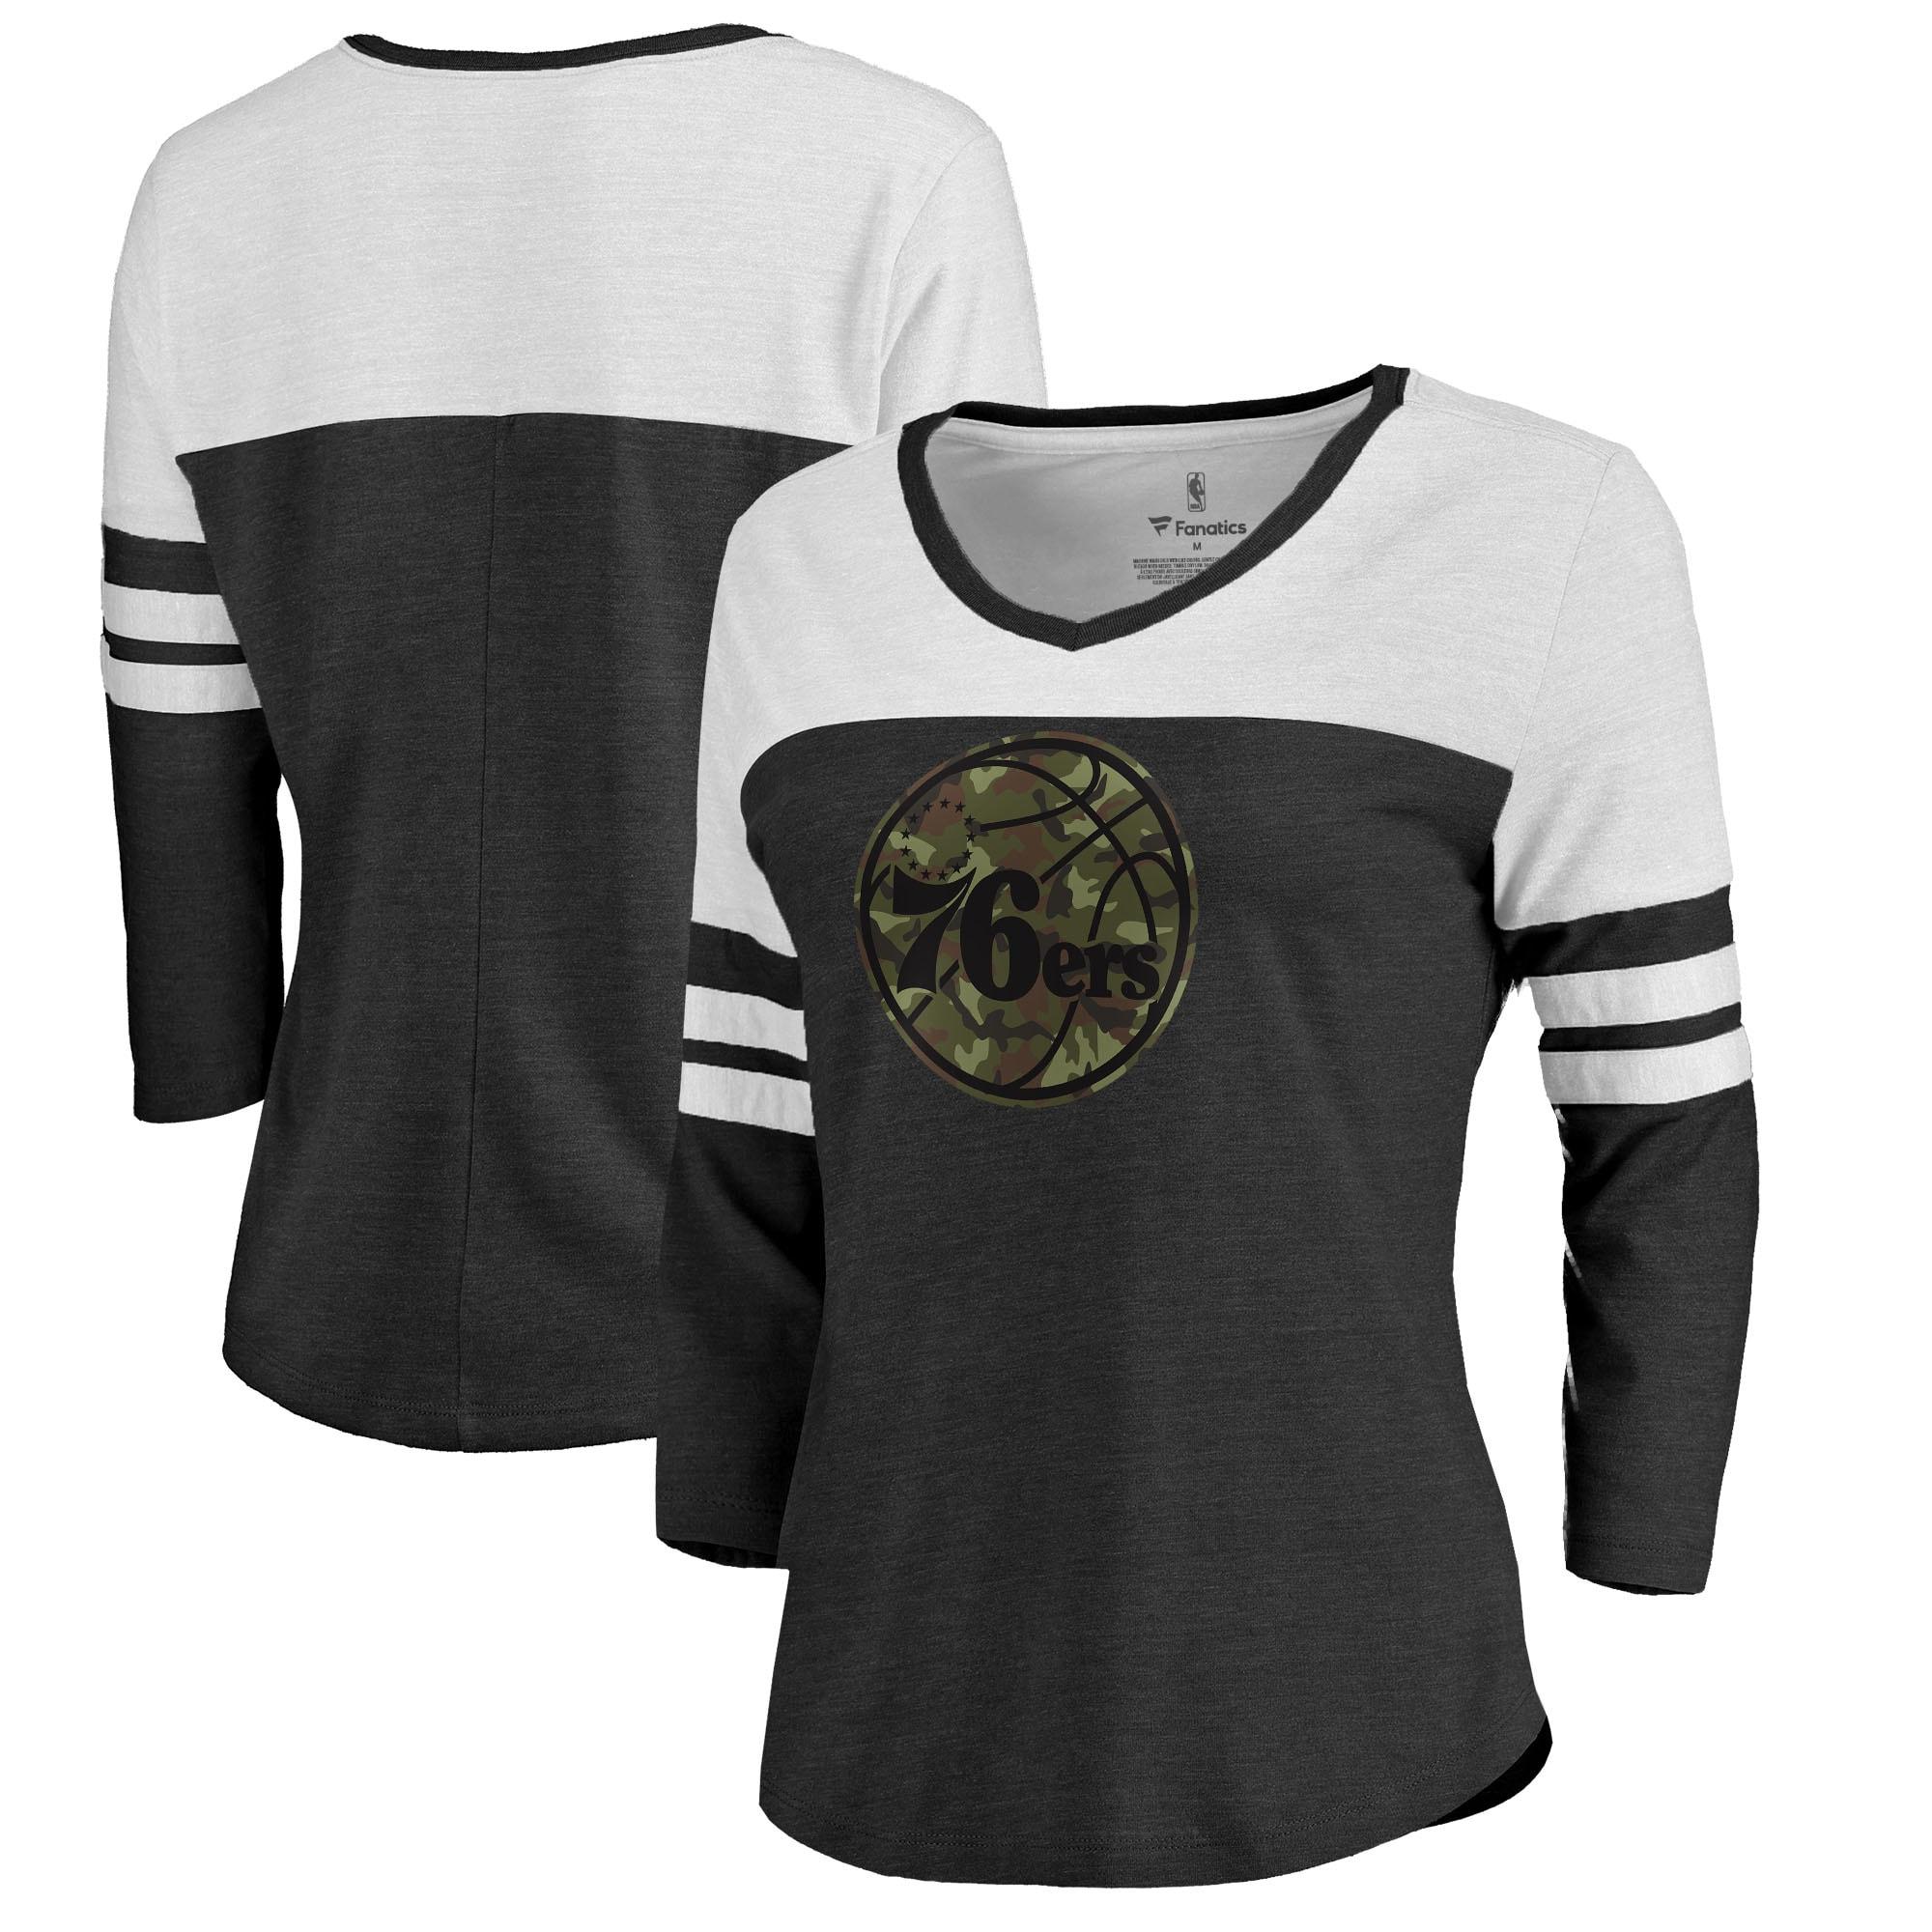 Philadelphia 76ers Fanatics Branded Women's Prestige Camo 3/4-Sleeve Raglan T-Shirt - Black